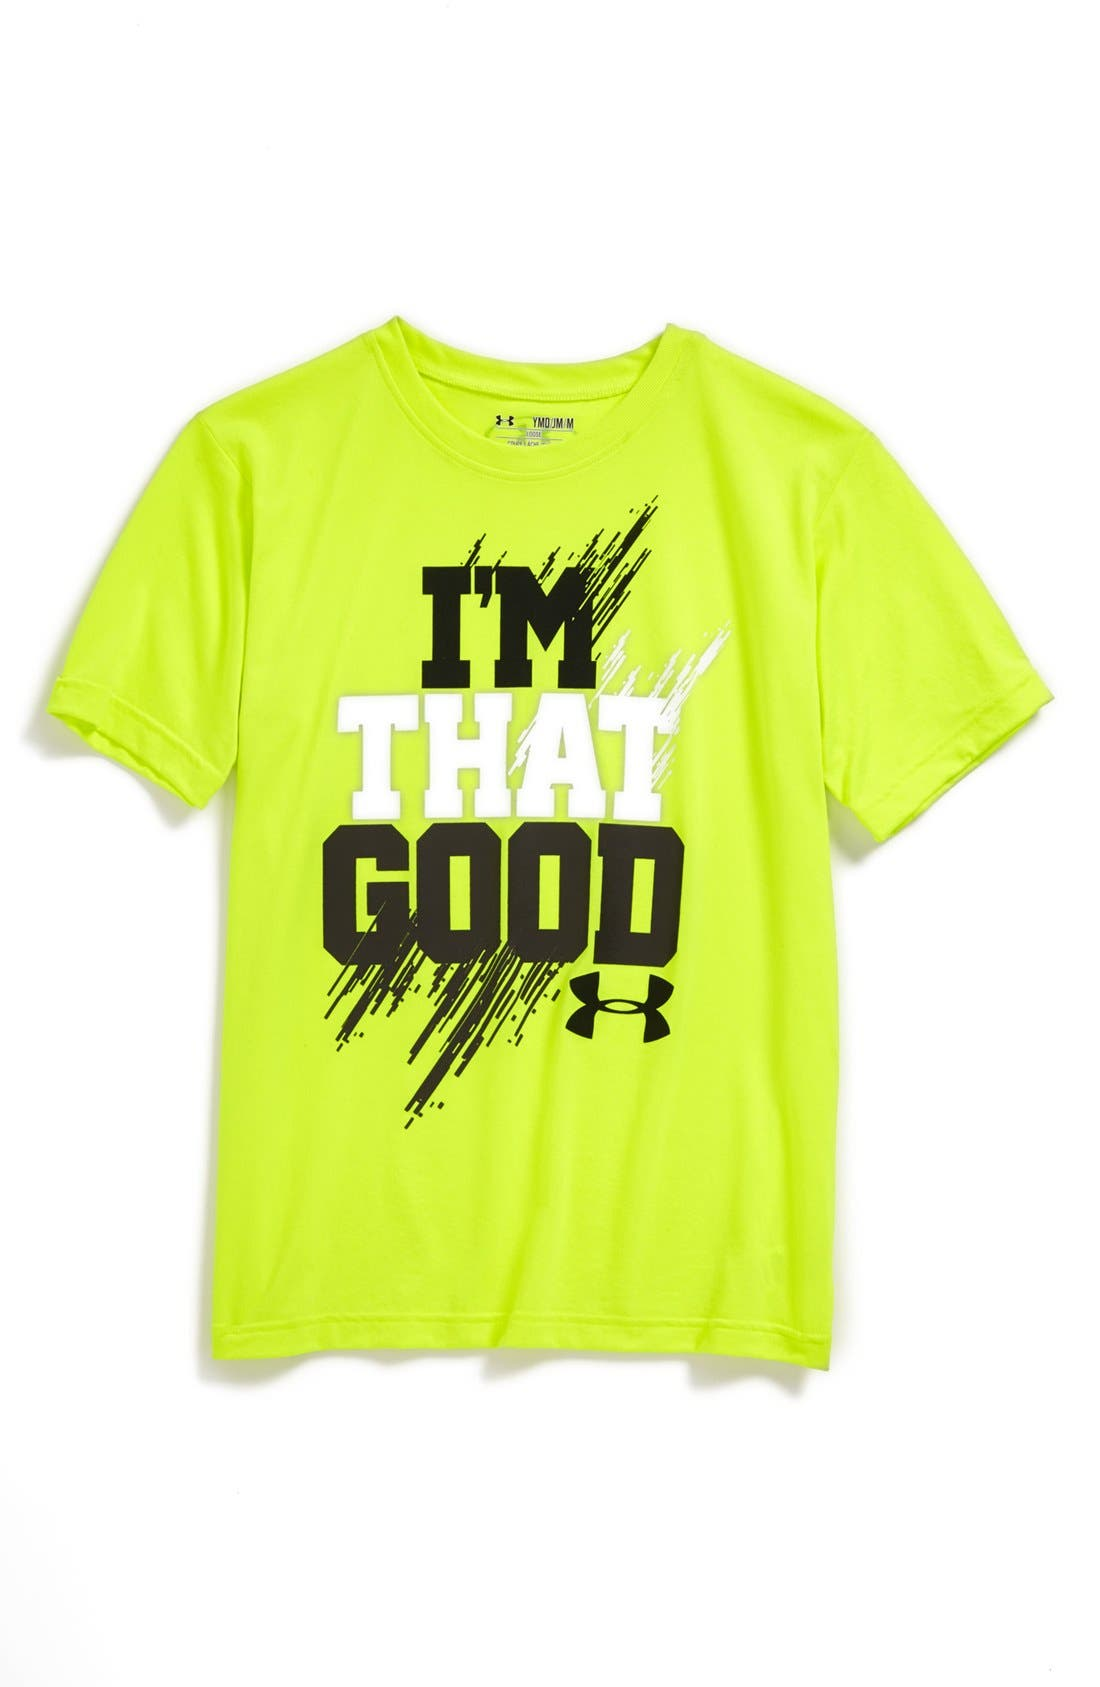 Alternate Image 1 Selected - Under Armour 'I'm That Good' HeatGear® T-Shirt (Big Boys)